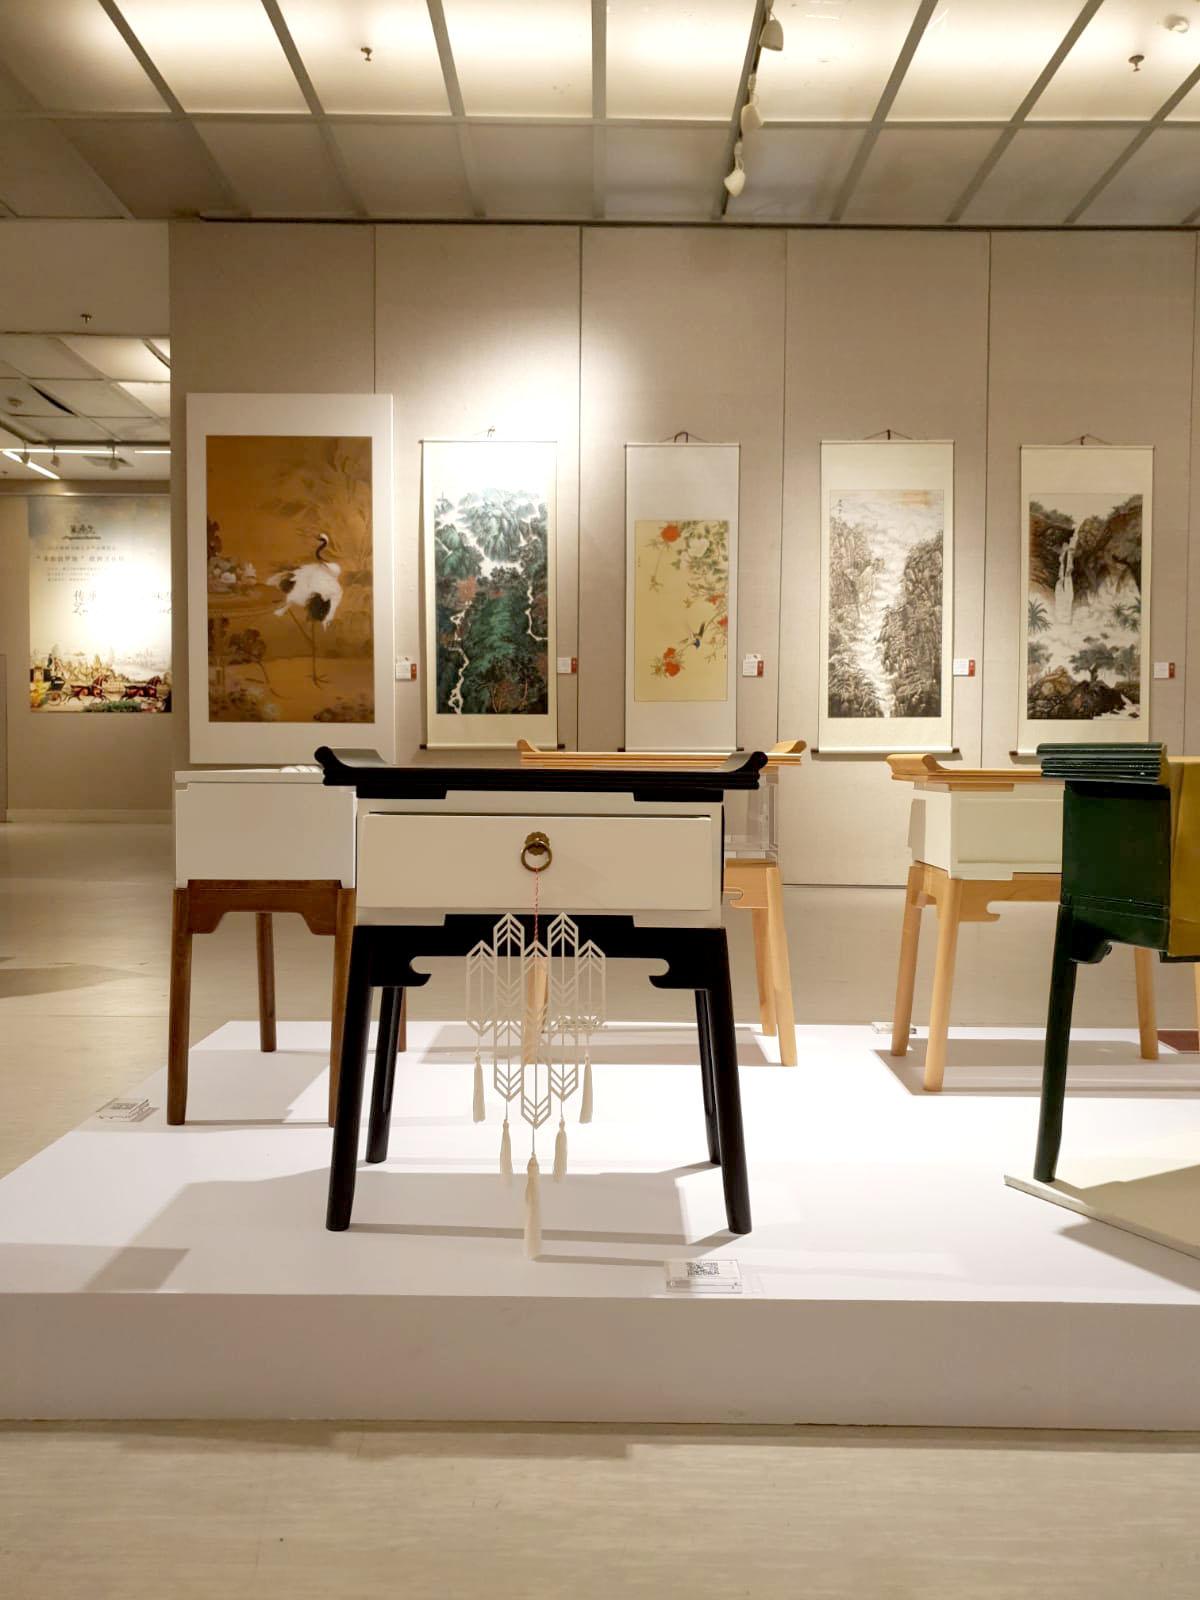 Collaborative Exhibition with Scene Shang in Xiamen, Fujian